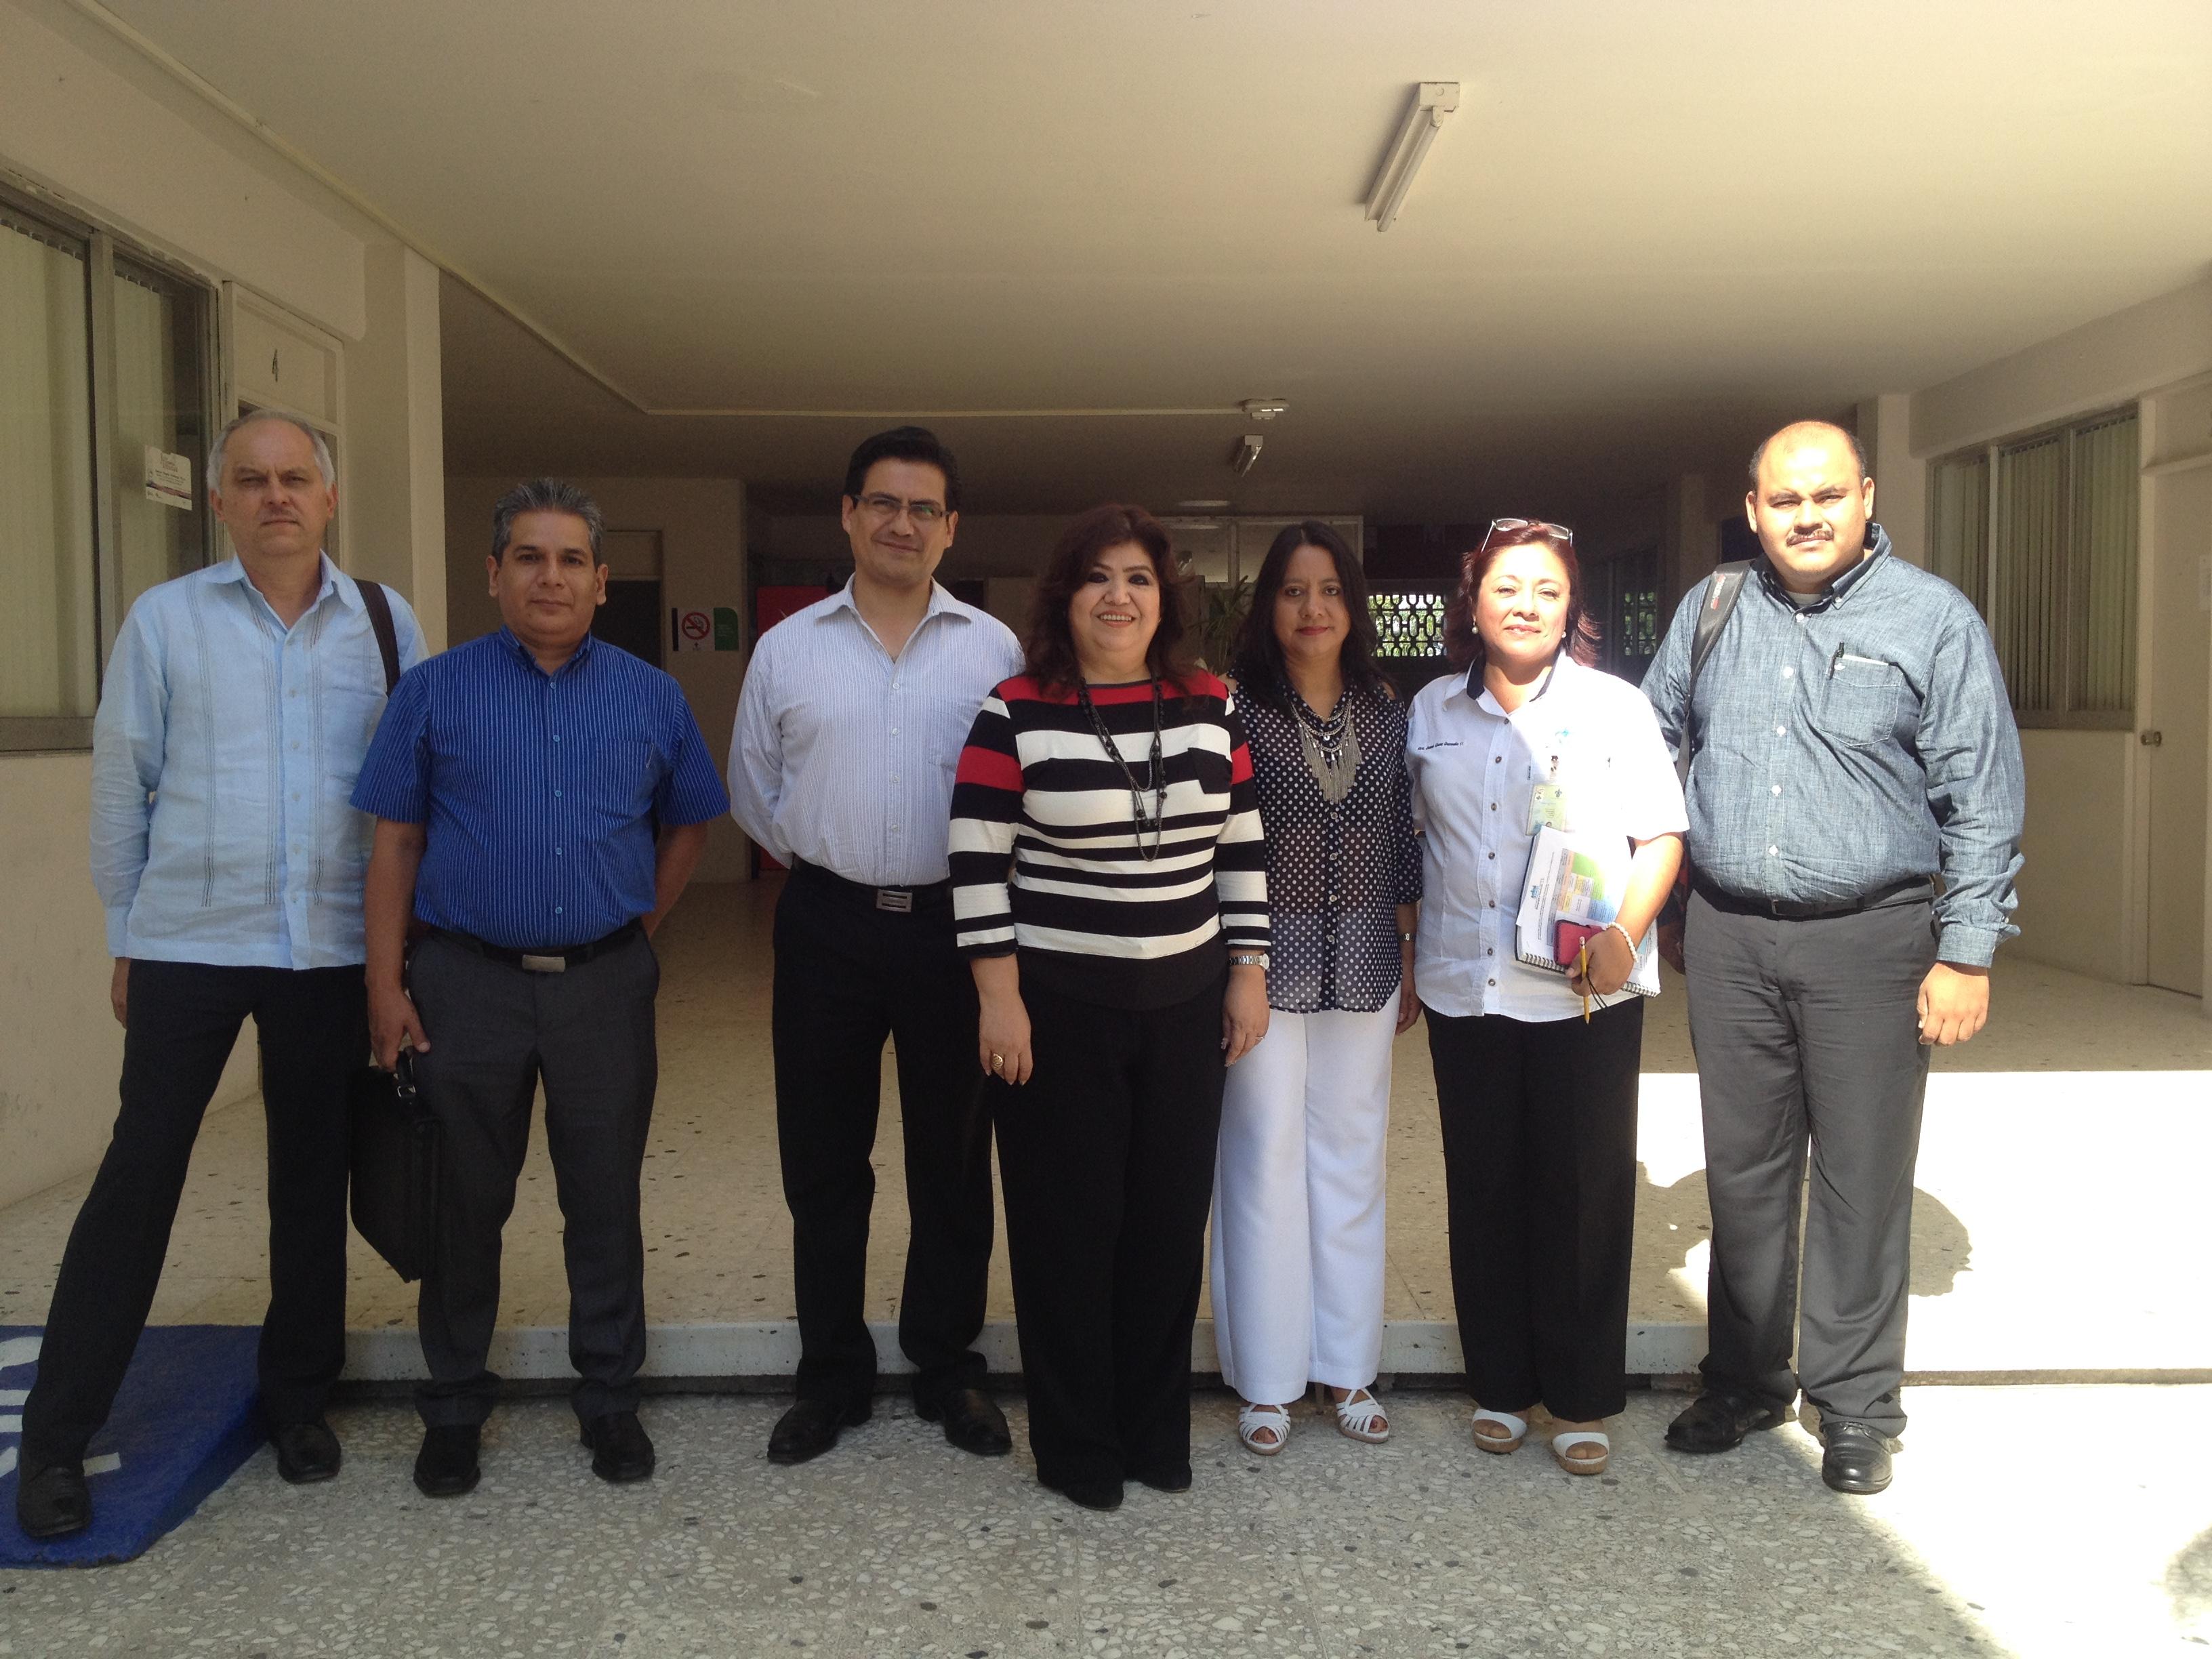 Proceso de reacreditación en Poza Rica, Veracruz